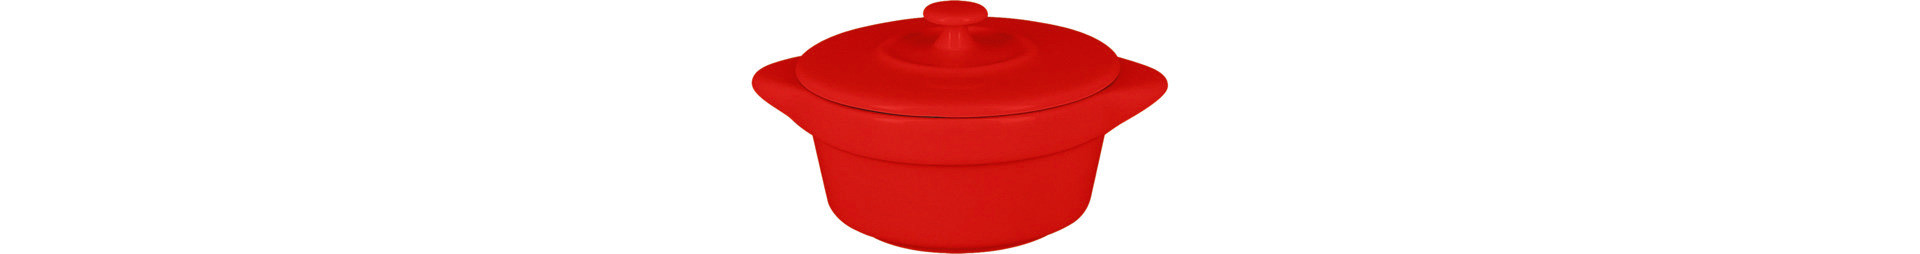 Chef's Fusion, Cocotte mit Deckel mini ø 85 mm / 0,11 l ember